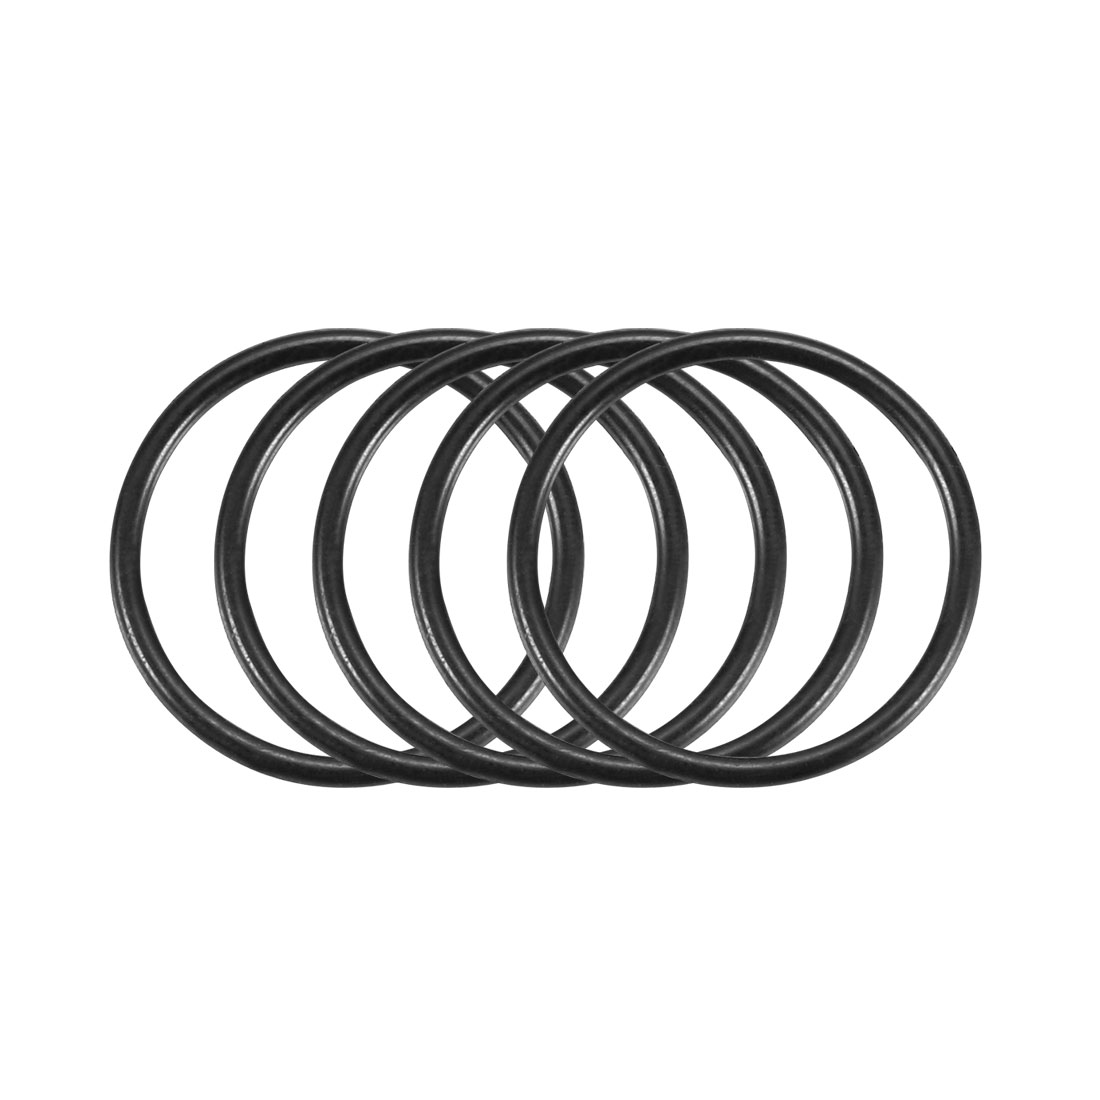 100Pcs Black 14mm x 1mm Nitrile Rubber O Ring NBR Oil Sealing Grommets